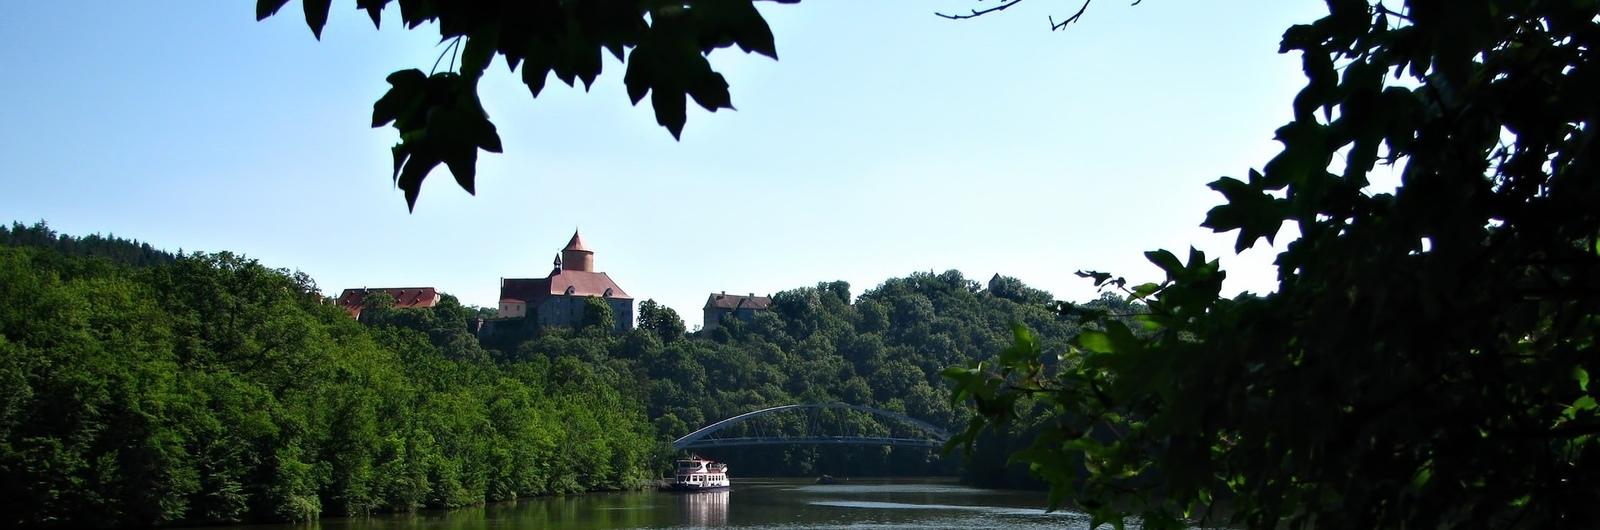 Brno hrad Veveří